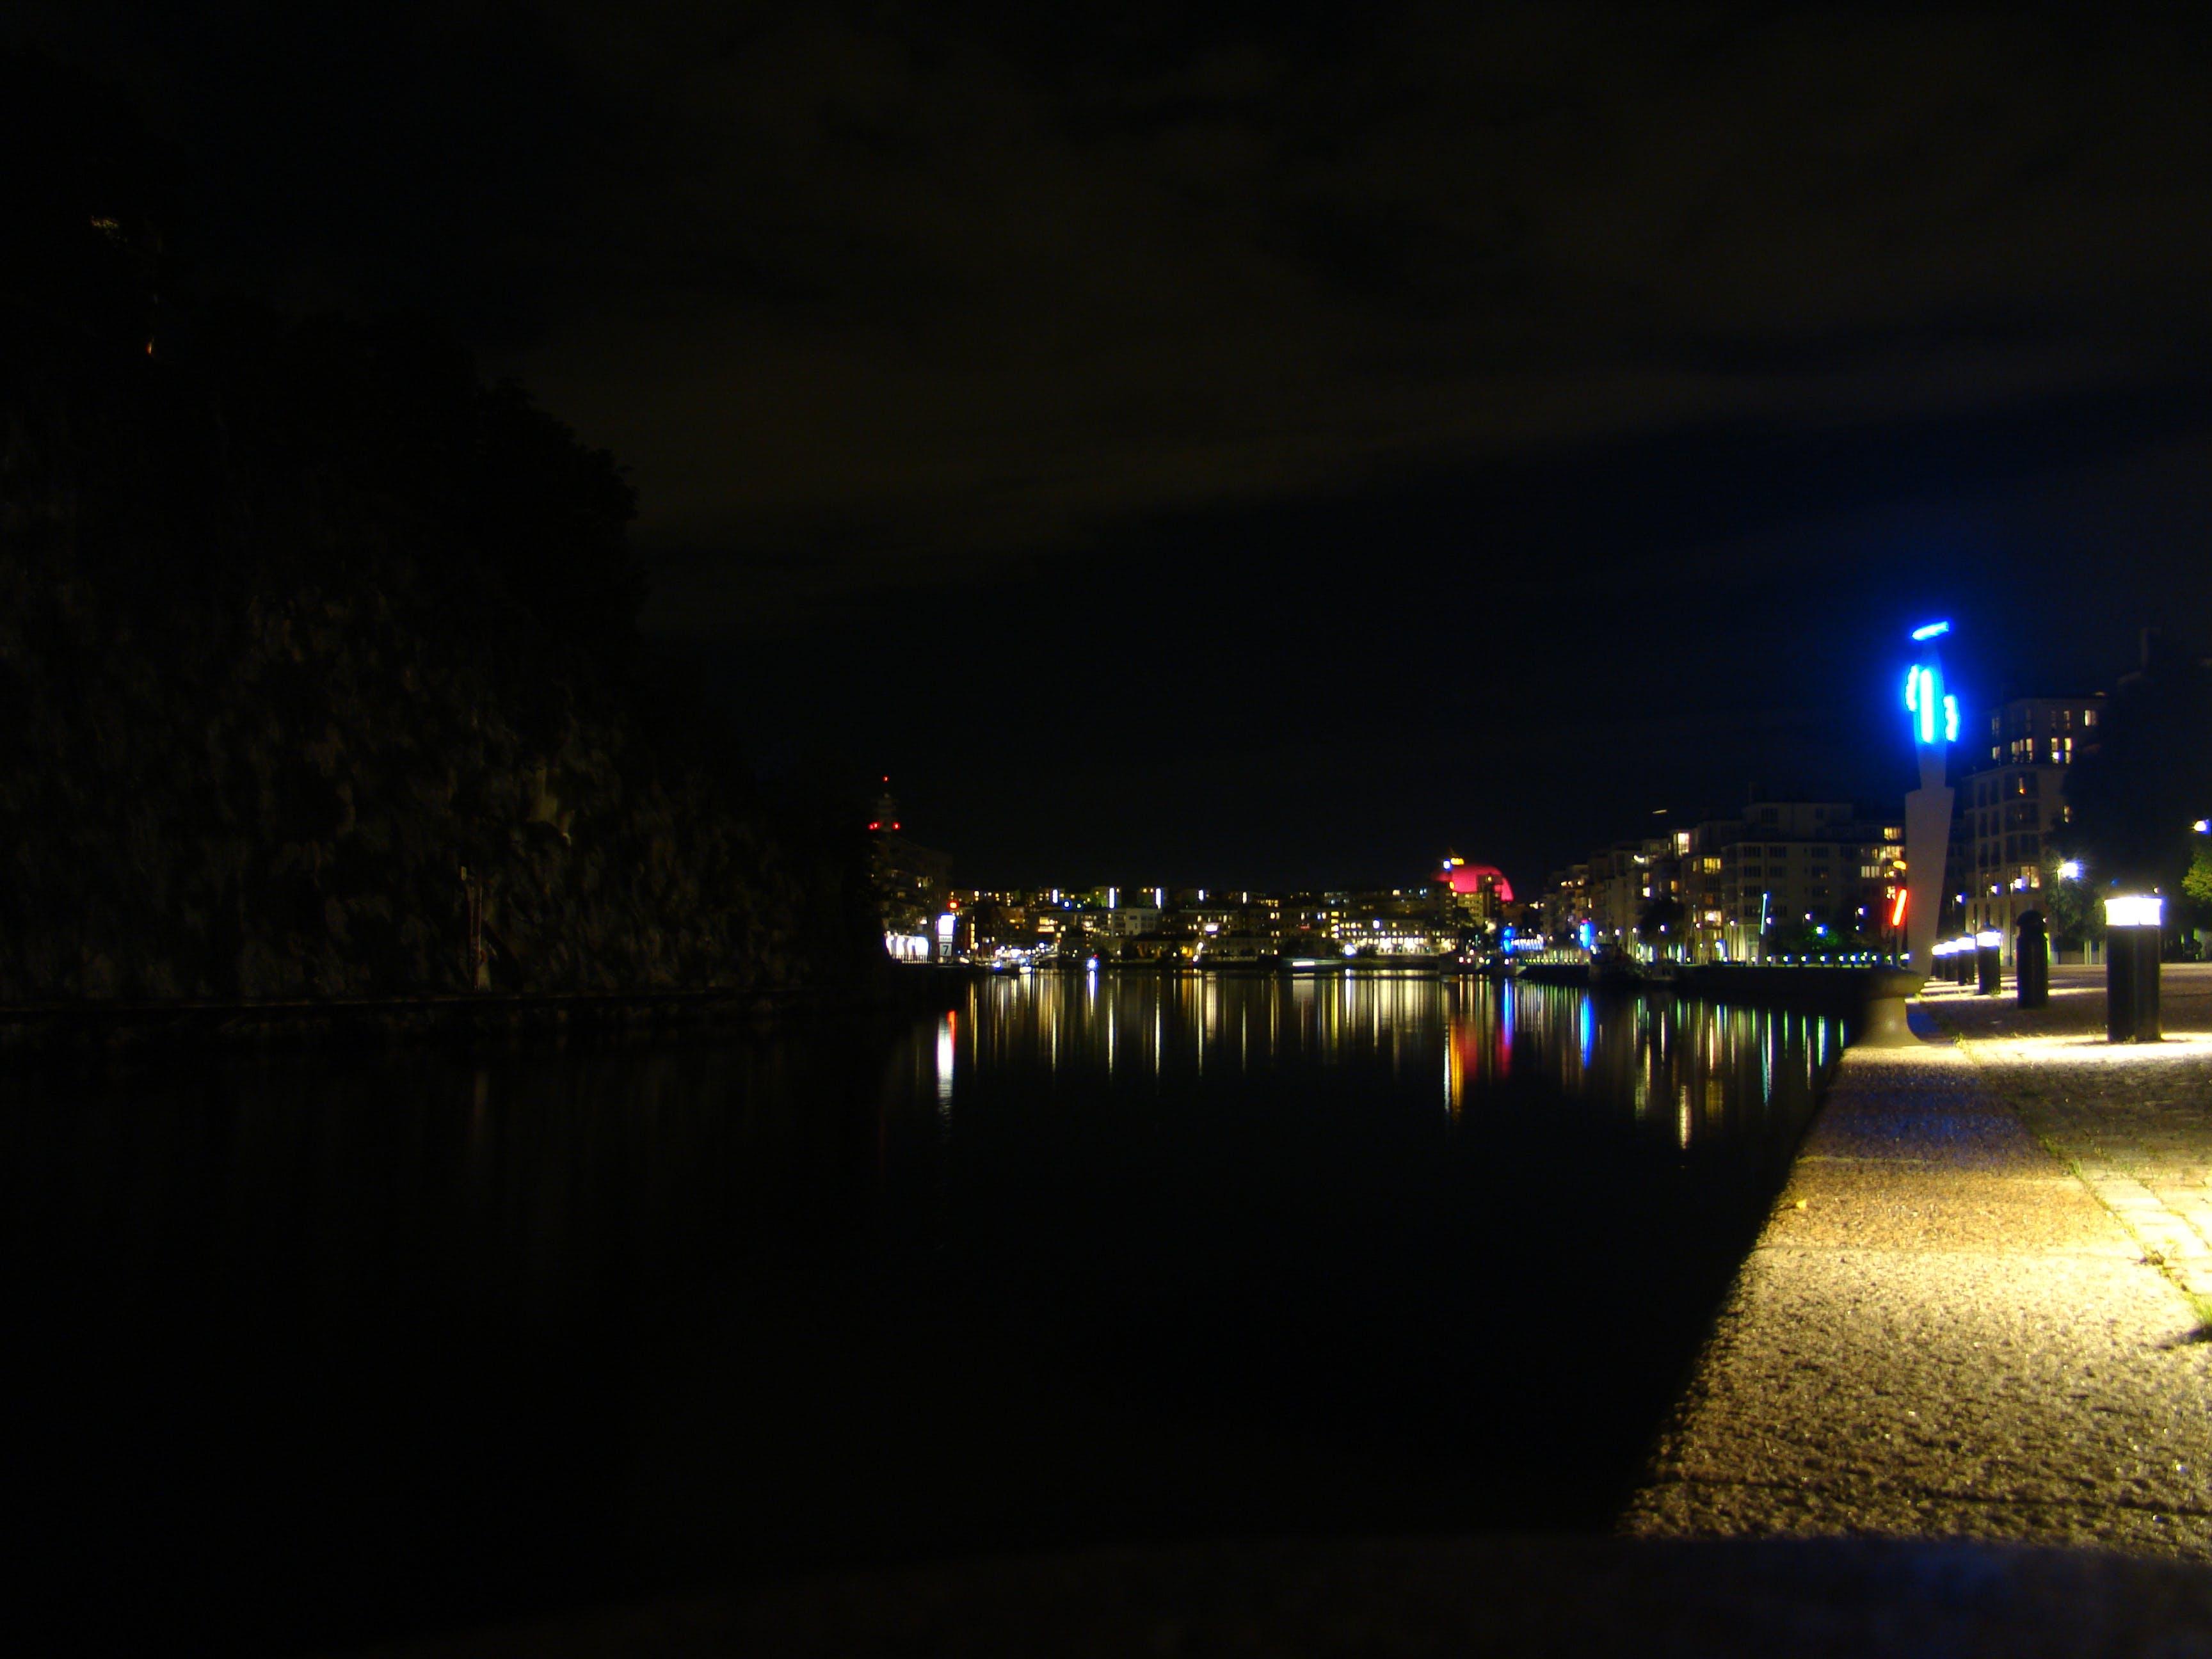 Free stock photo of light, night, sweden, reflex